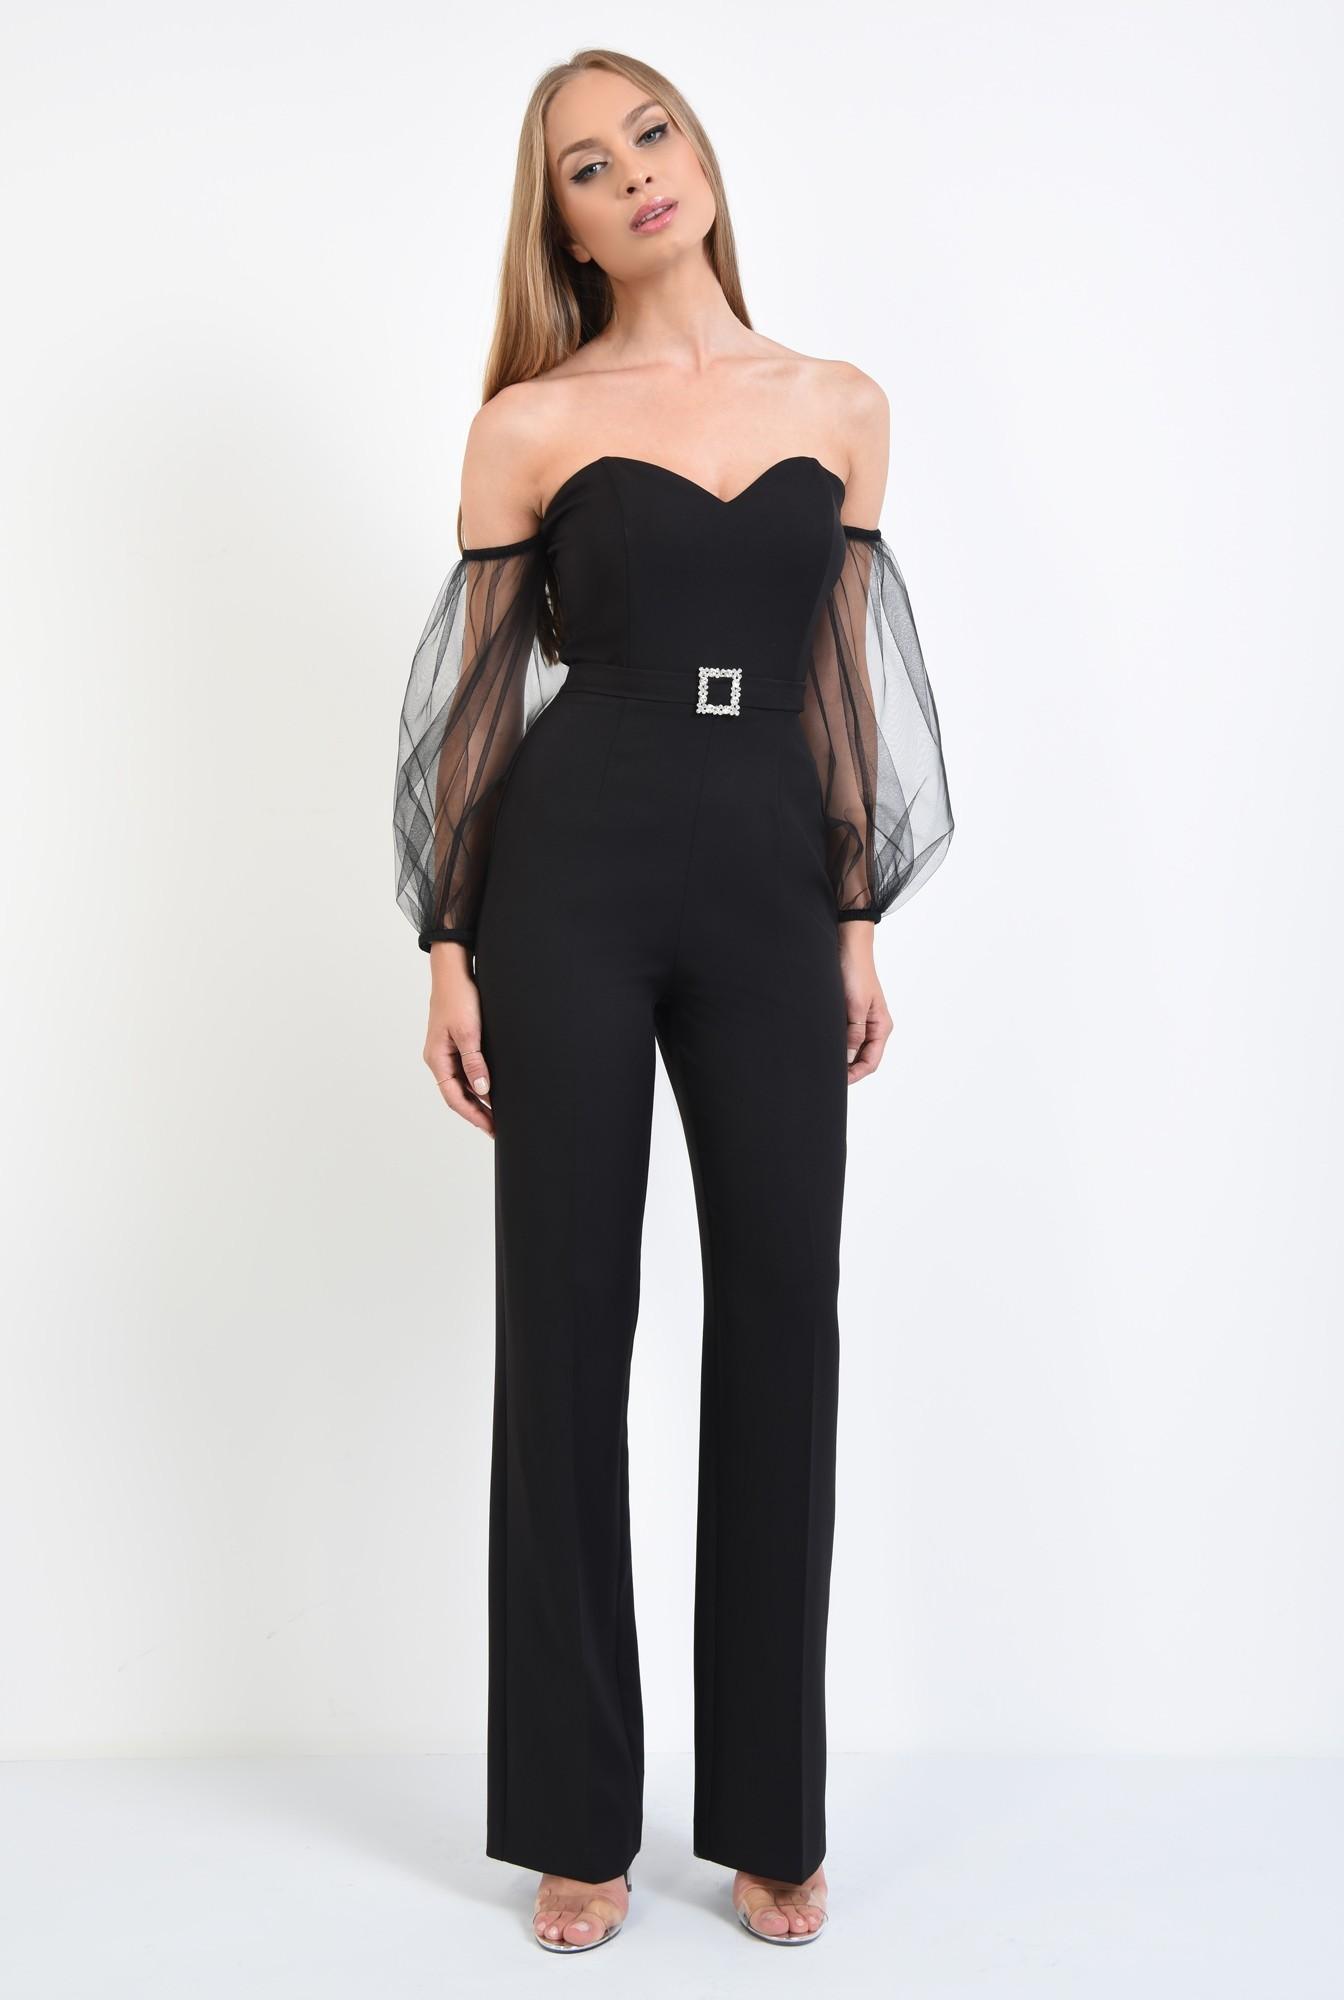 3 - salopeta eleganta, maneci tul, corset, centura decorativa